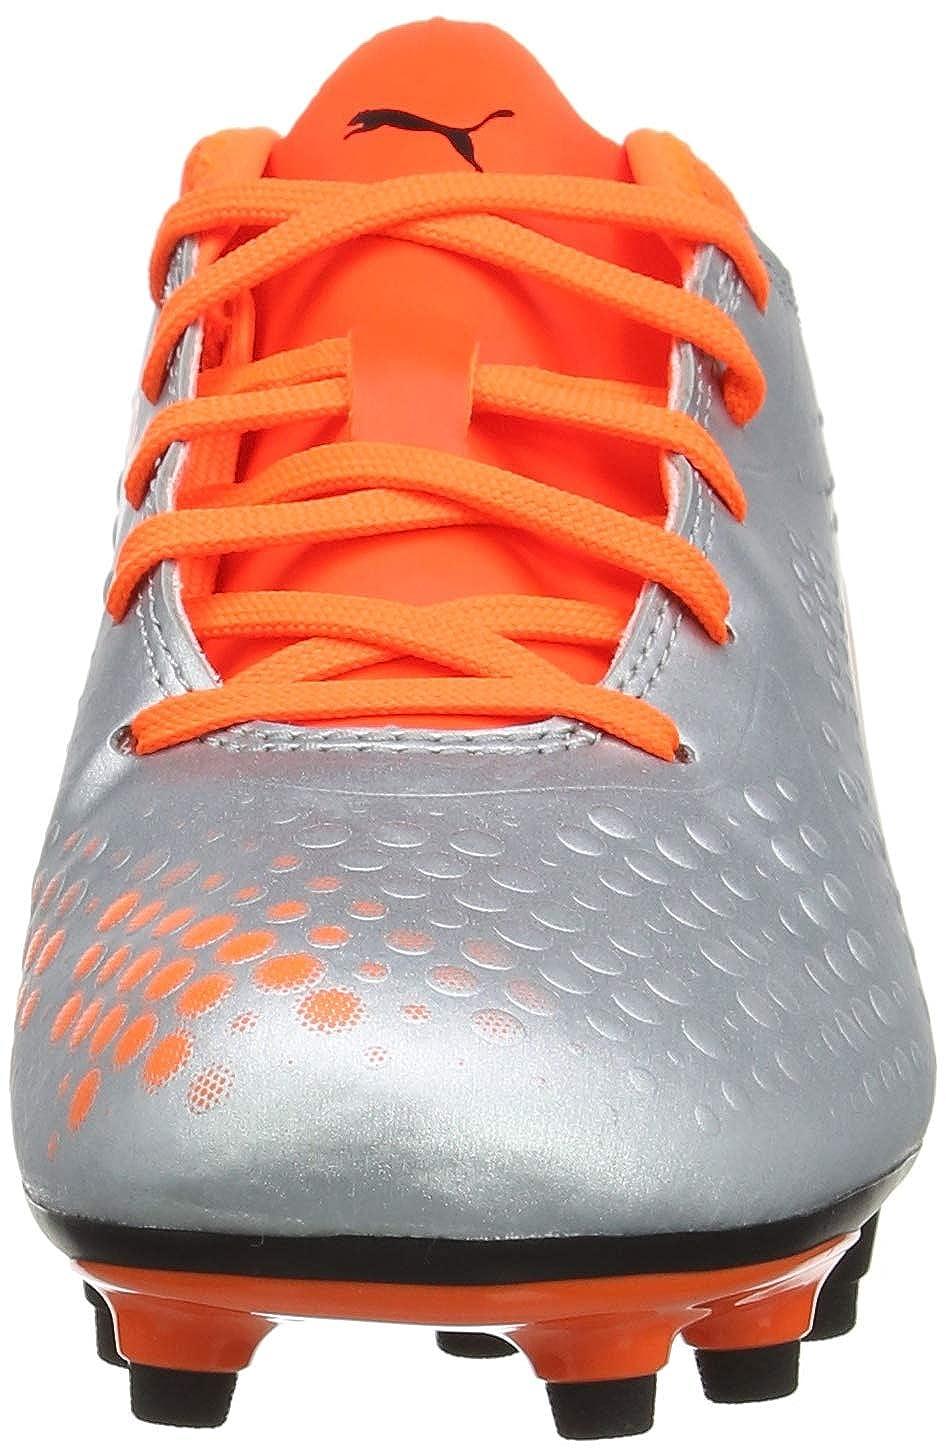 Puma Kids One 4 Syn Fg Jr Footbal Shoes  Amazon.co.uk  Shoes   Bags 358d7ba51